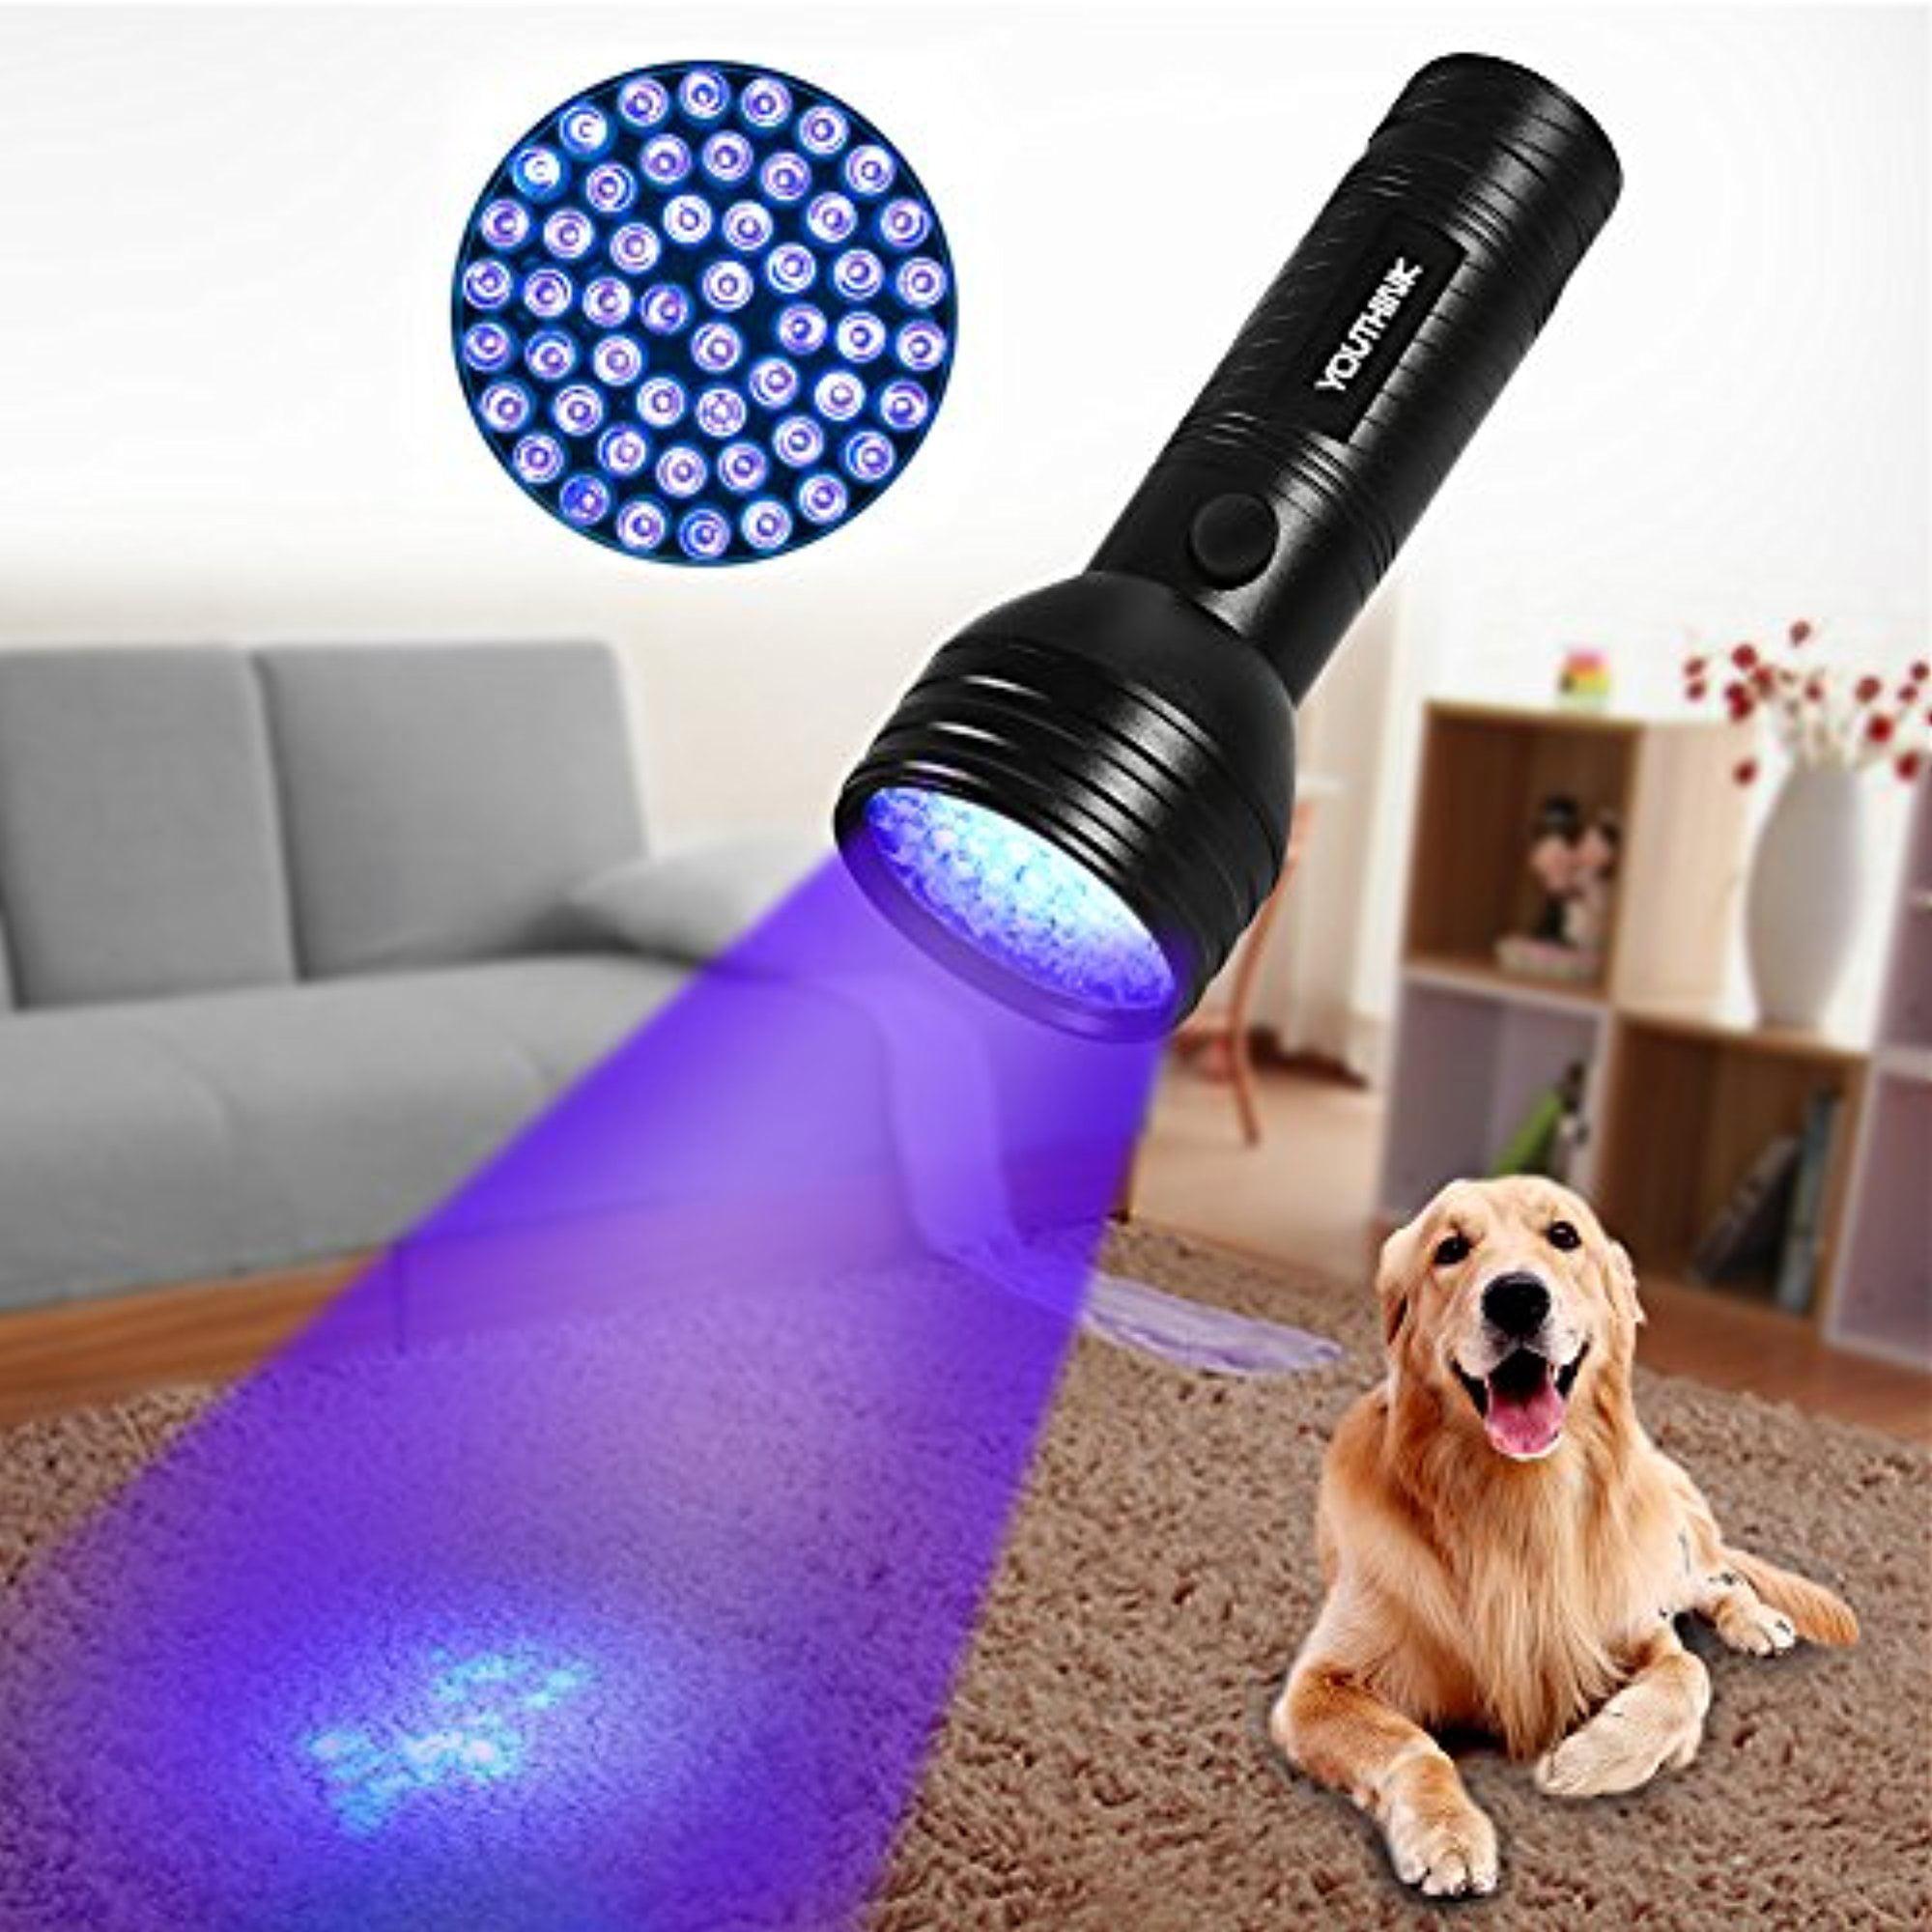 Pet Urine Detector Light Handheld UV Black Light Flashlight Portable Dog Cat